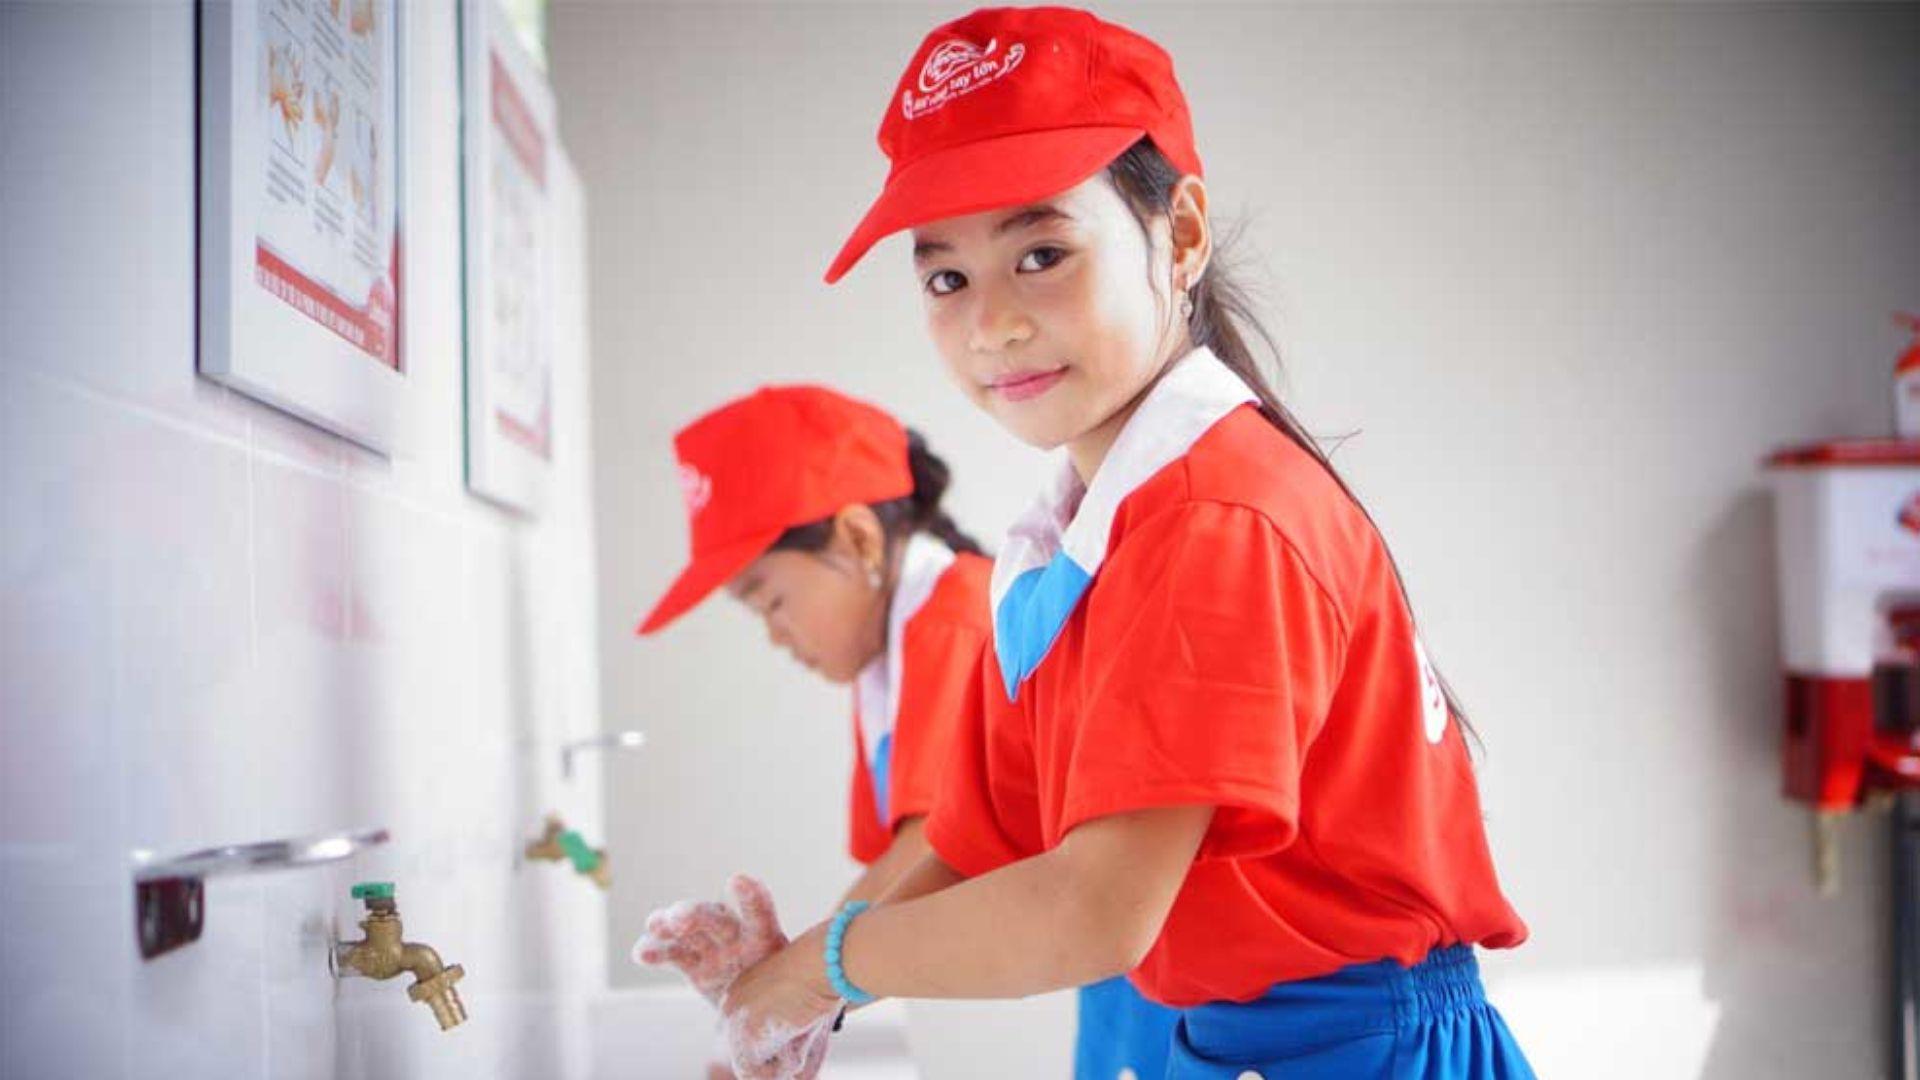 Girls washing their hands